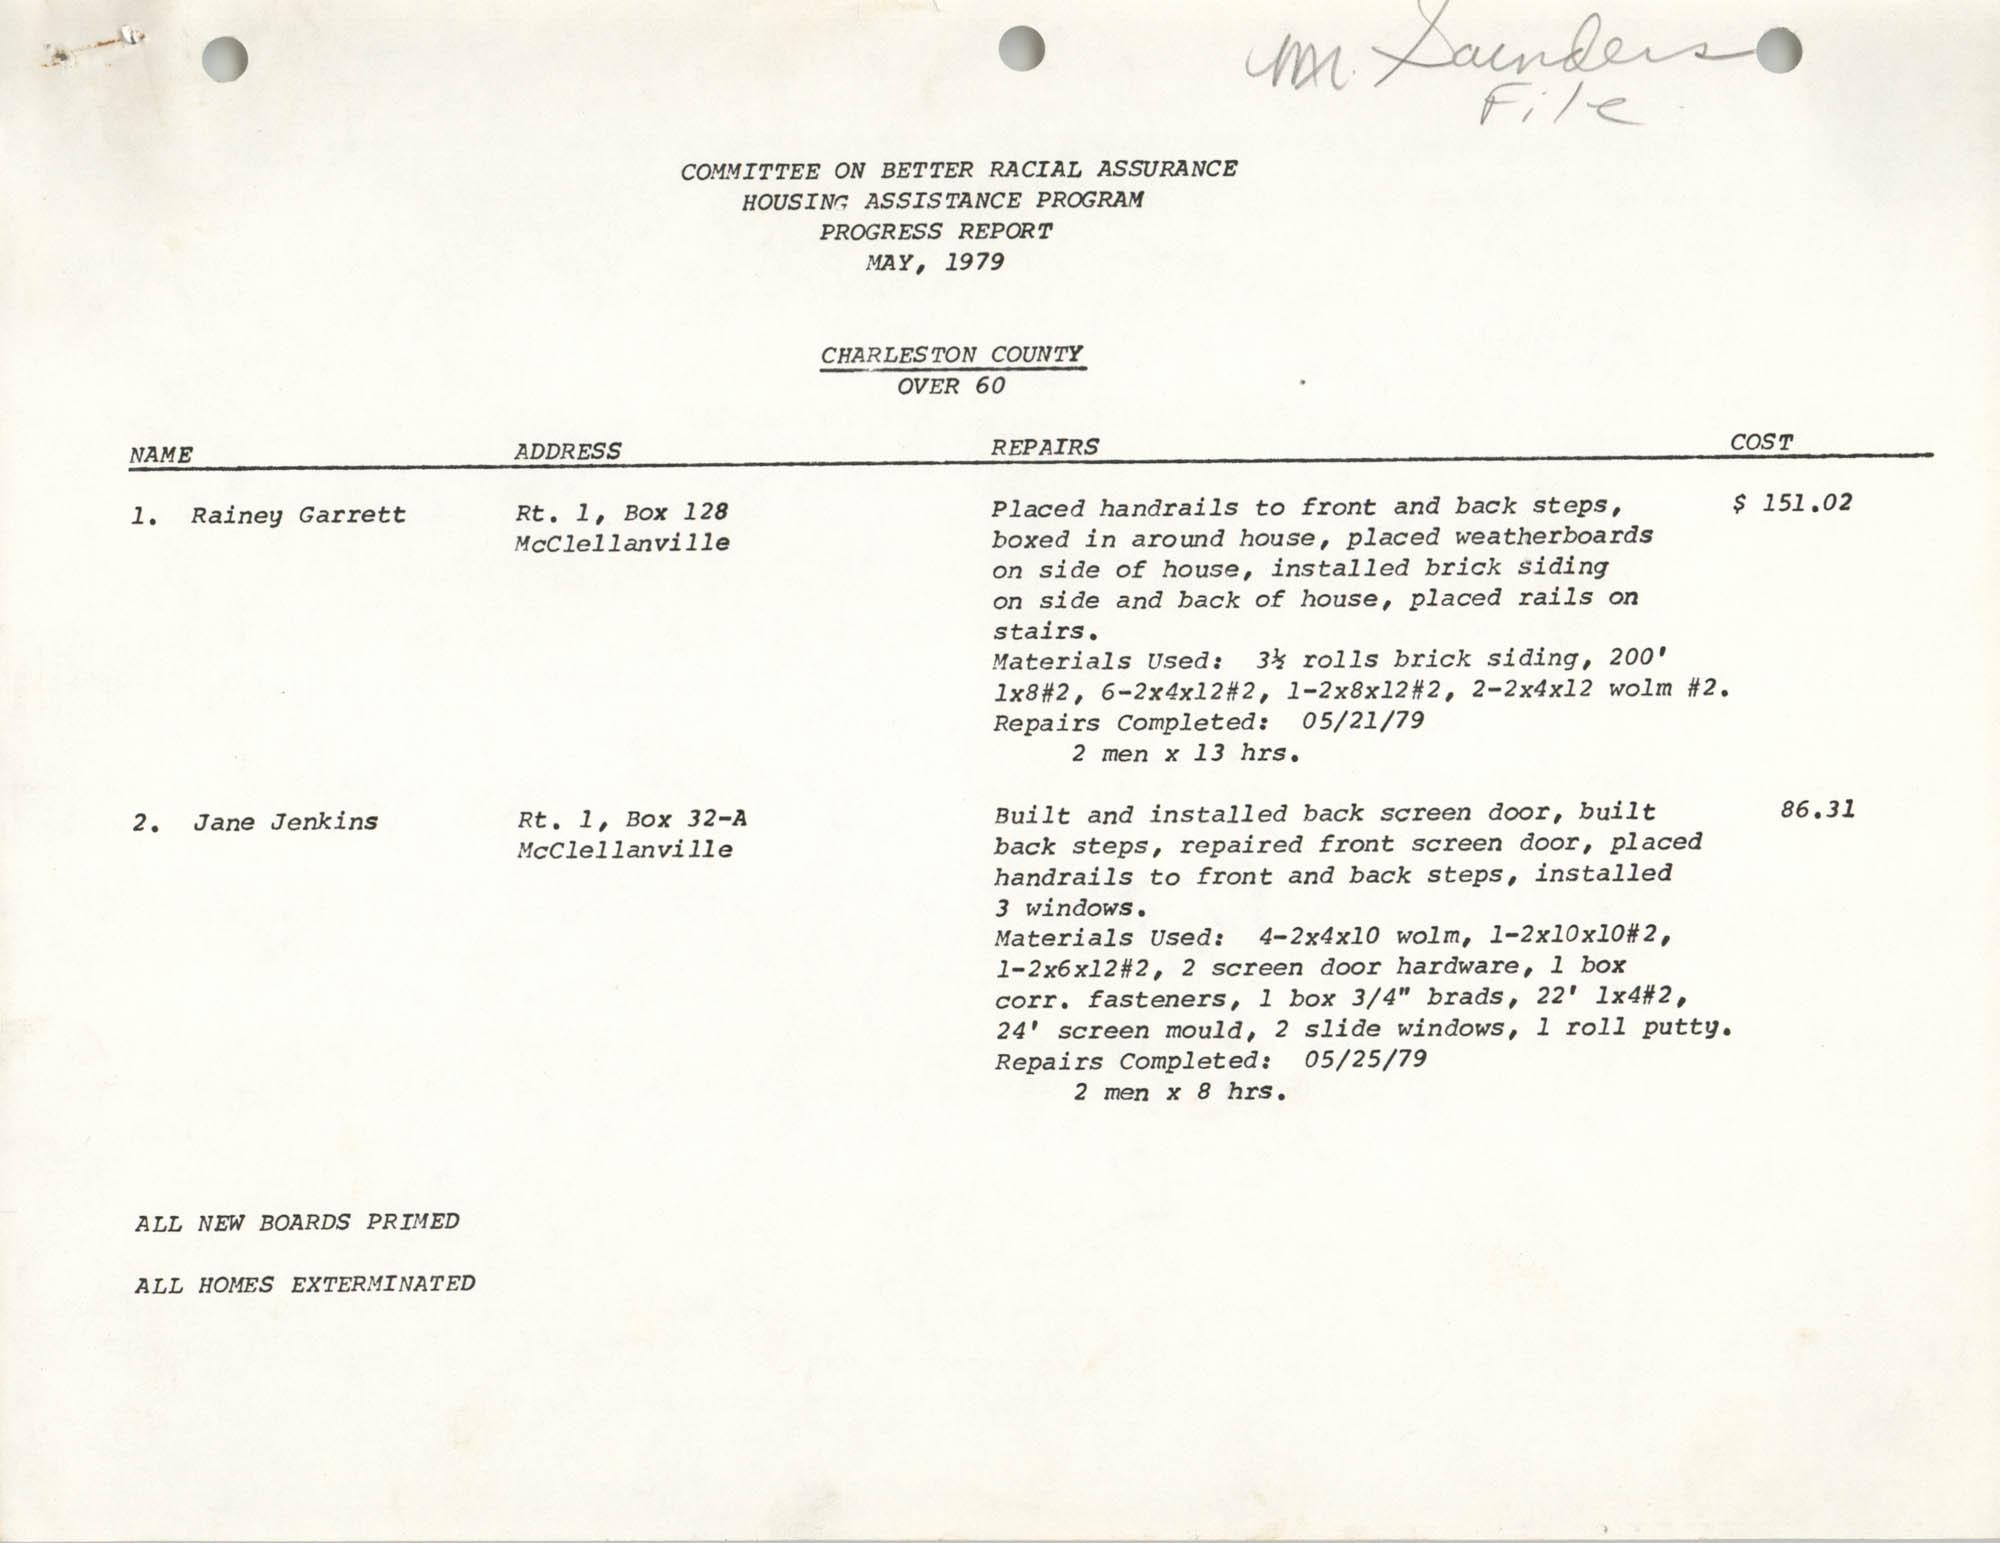 COBRA Housing Assistance Program Progress Report, May 1979